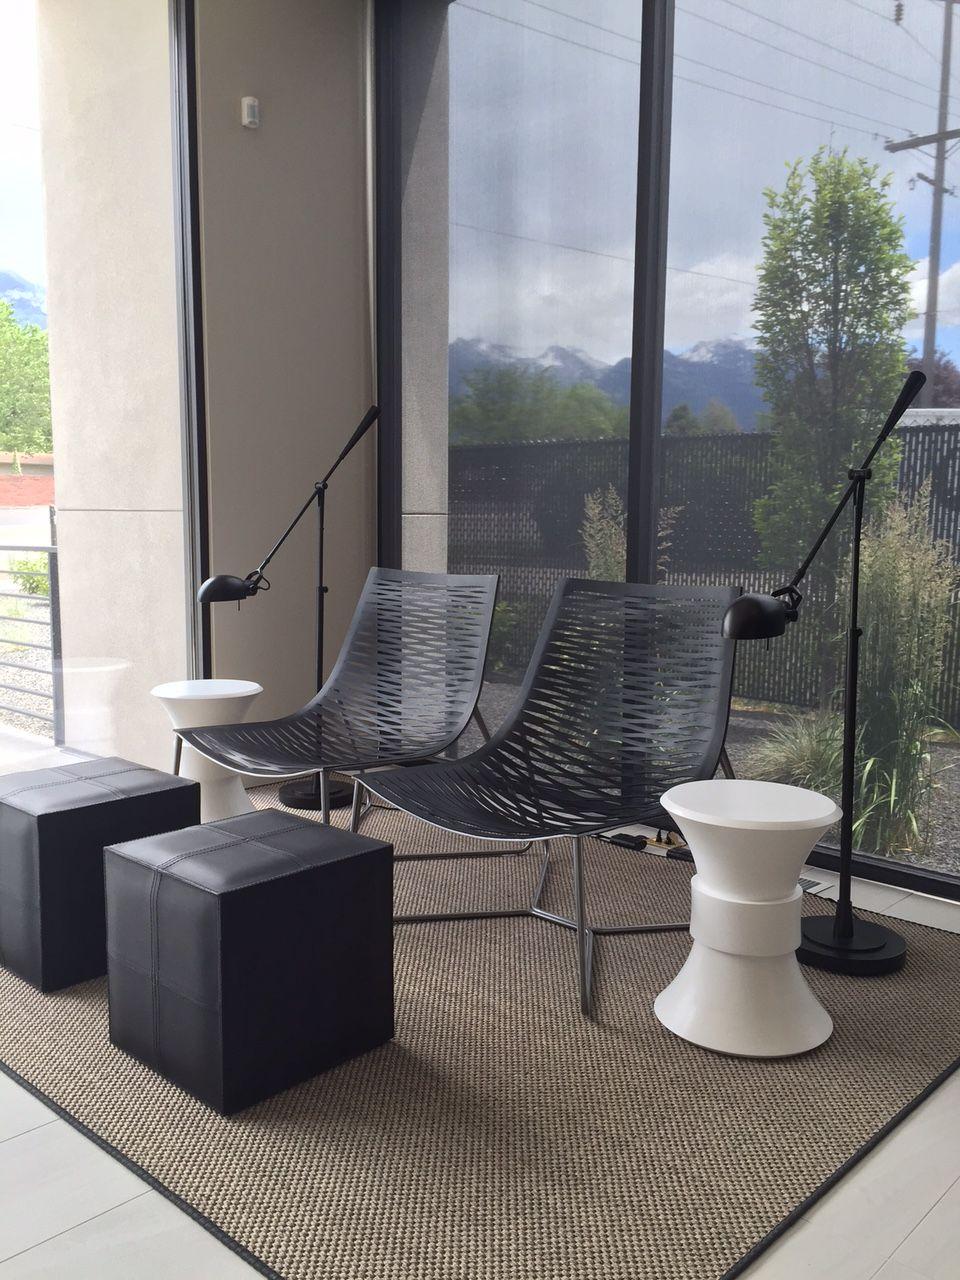 Super York Lounge Chair In 2019 Mi Casa Es Su Casa House Machost Co Dining Chair Design Ideas Machostcouk